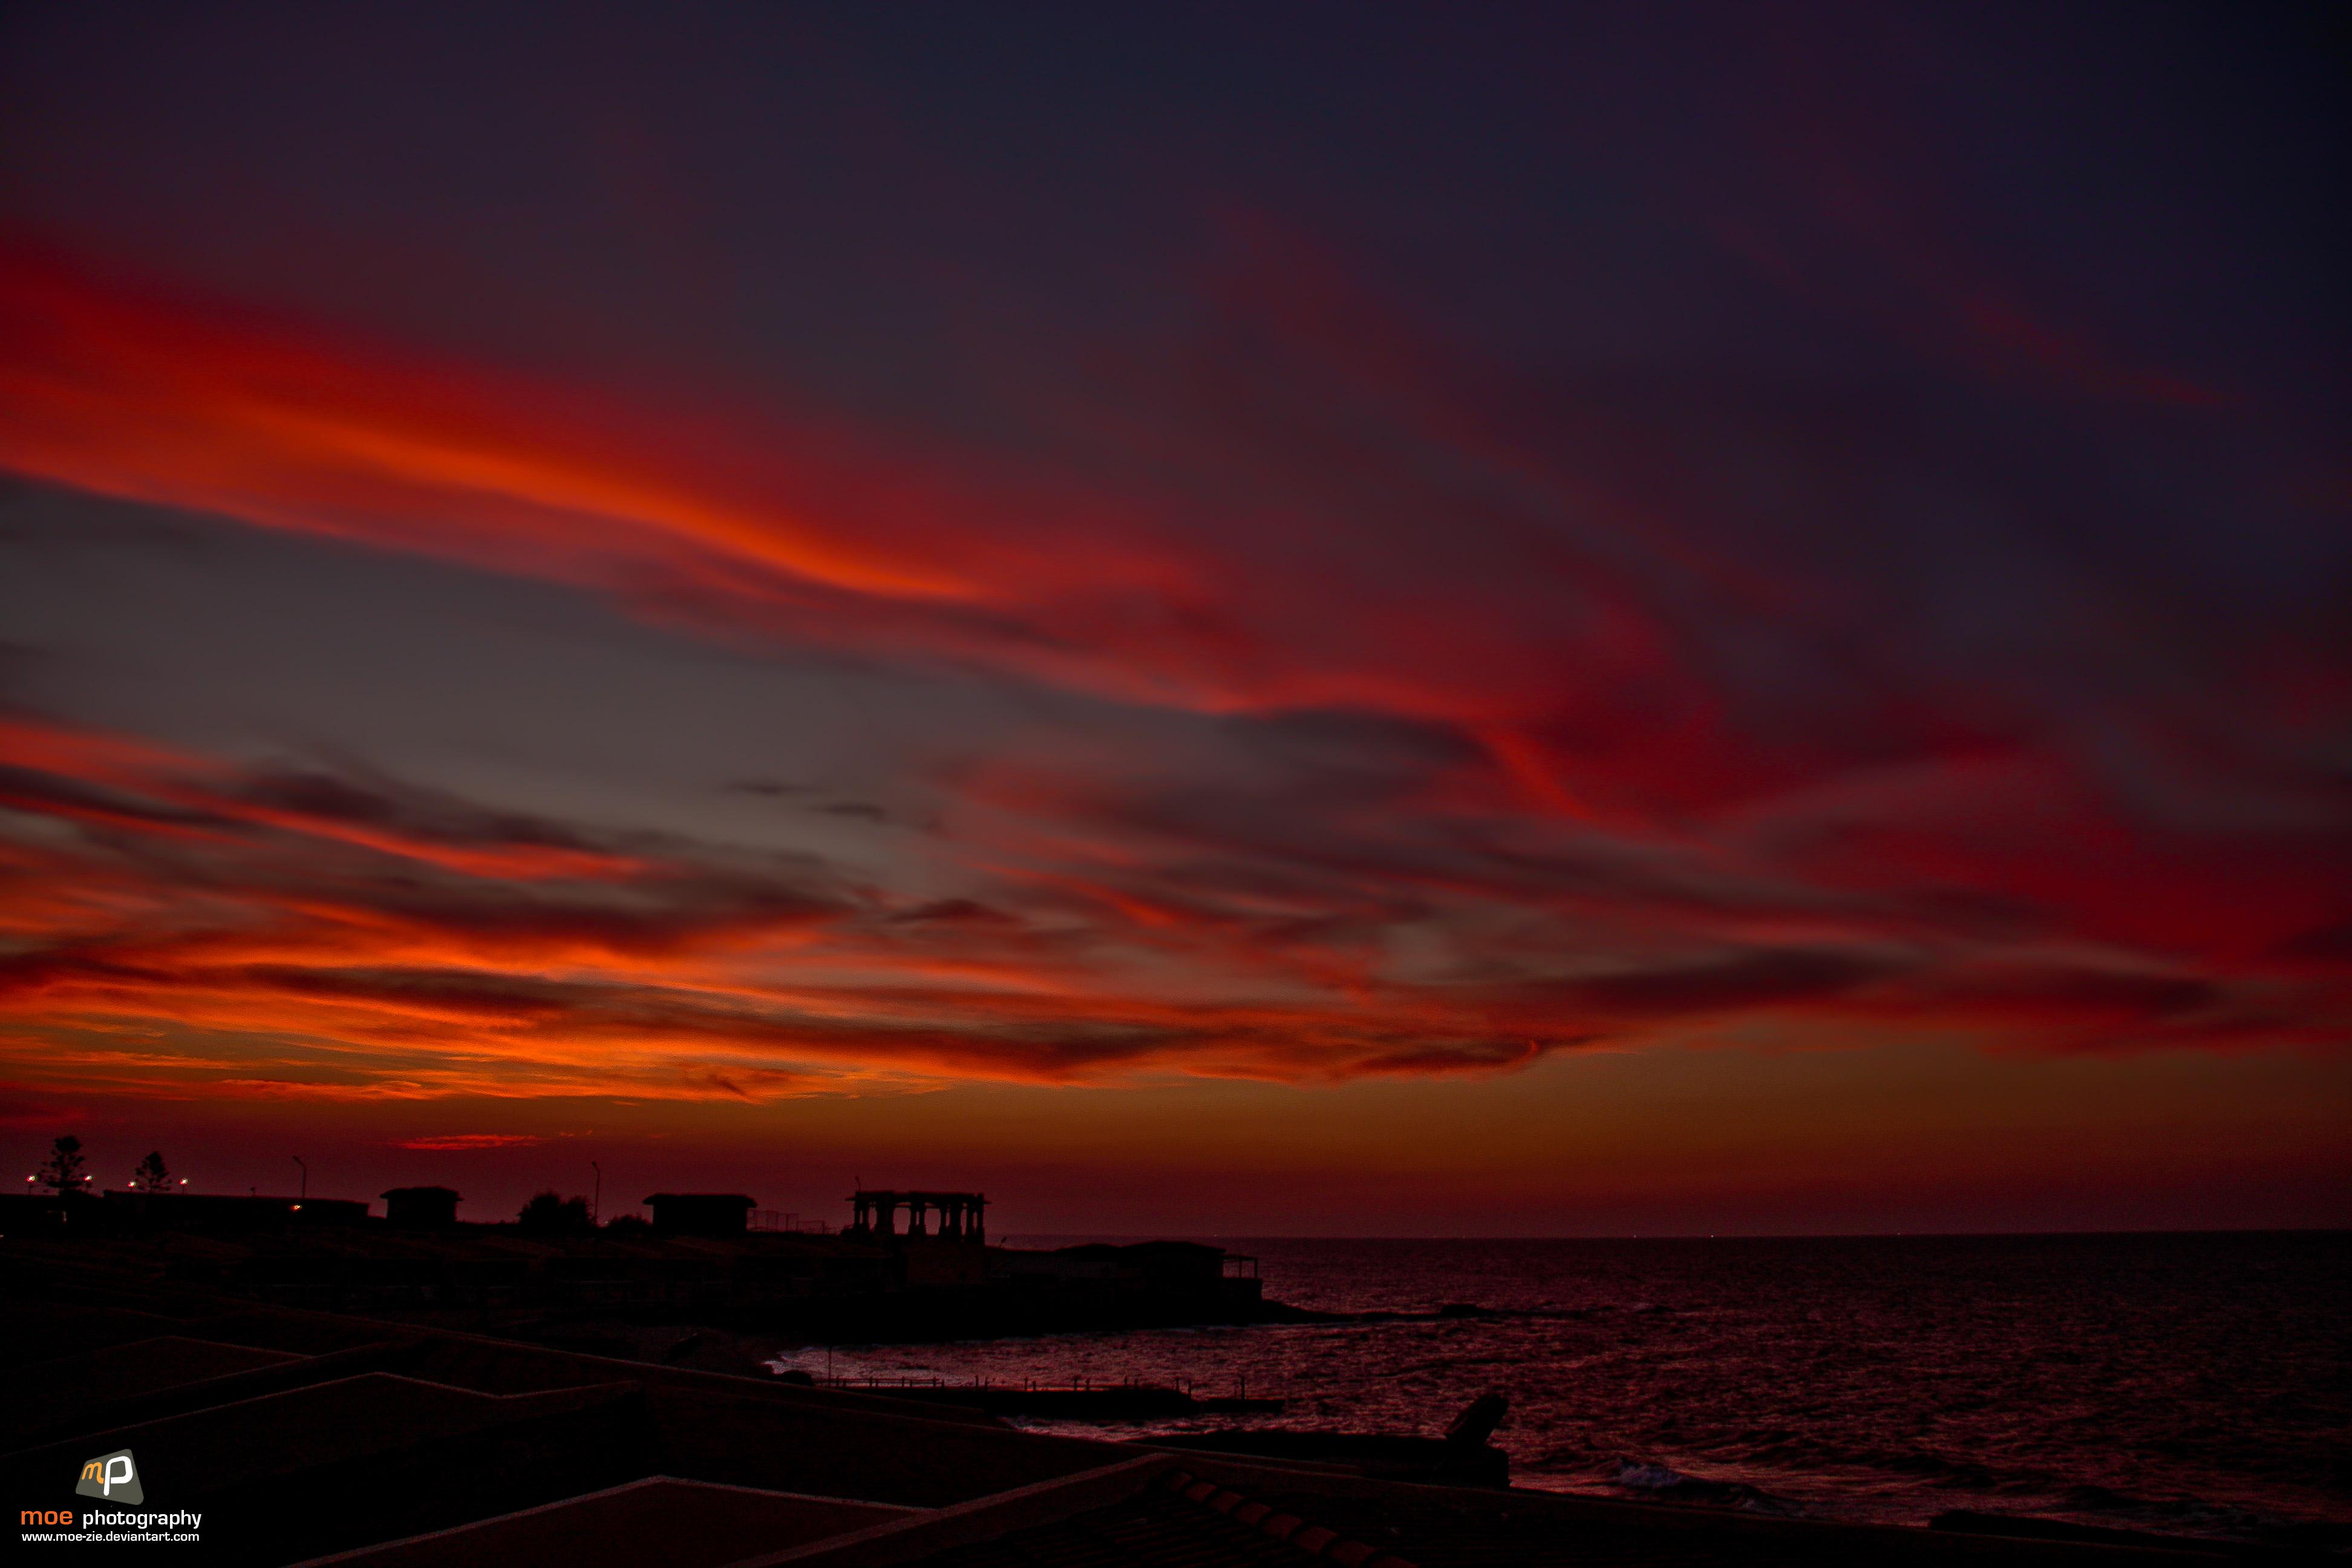 sunset sky vol3brilliant - photo #20